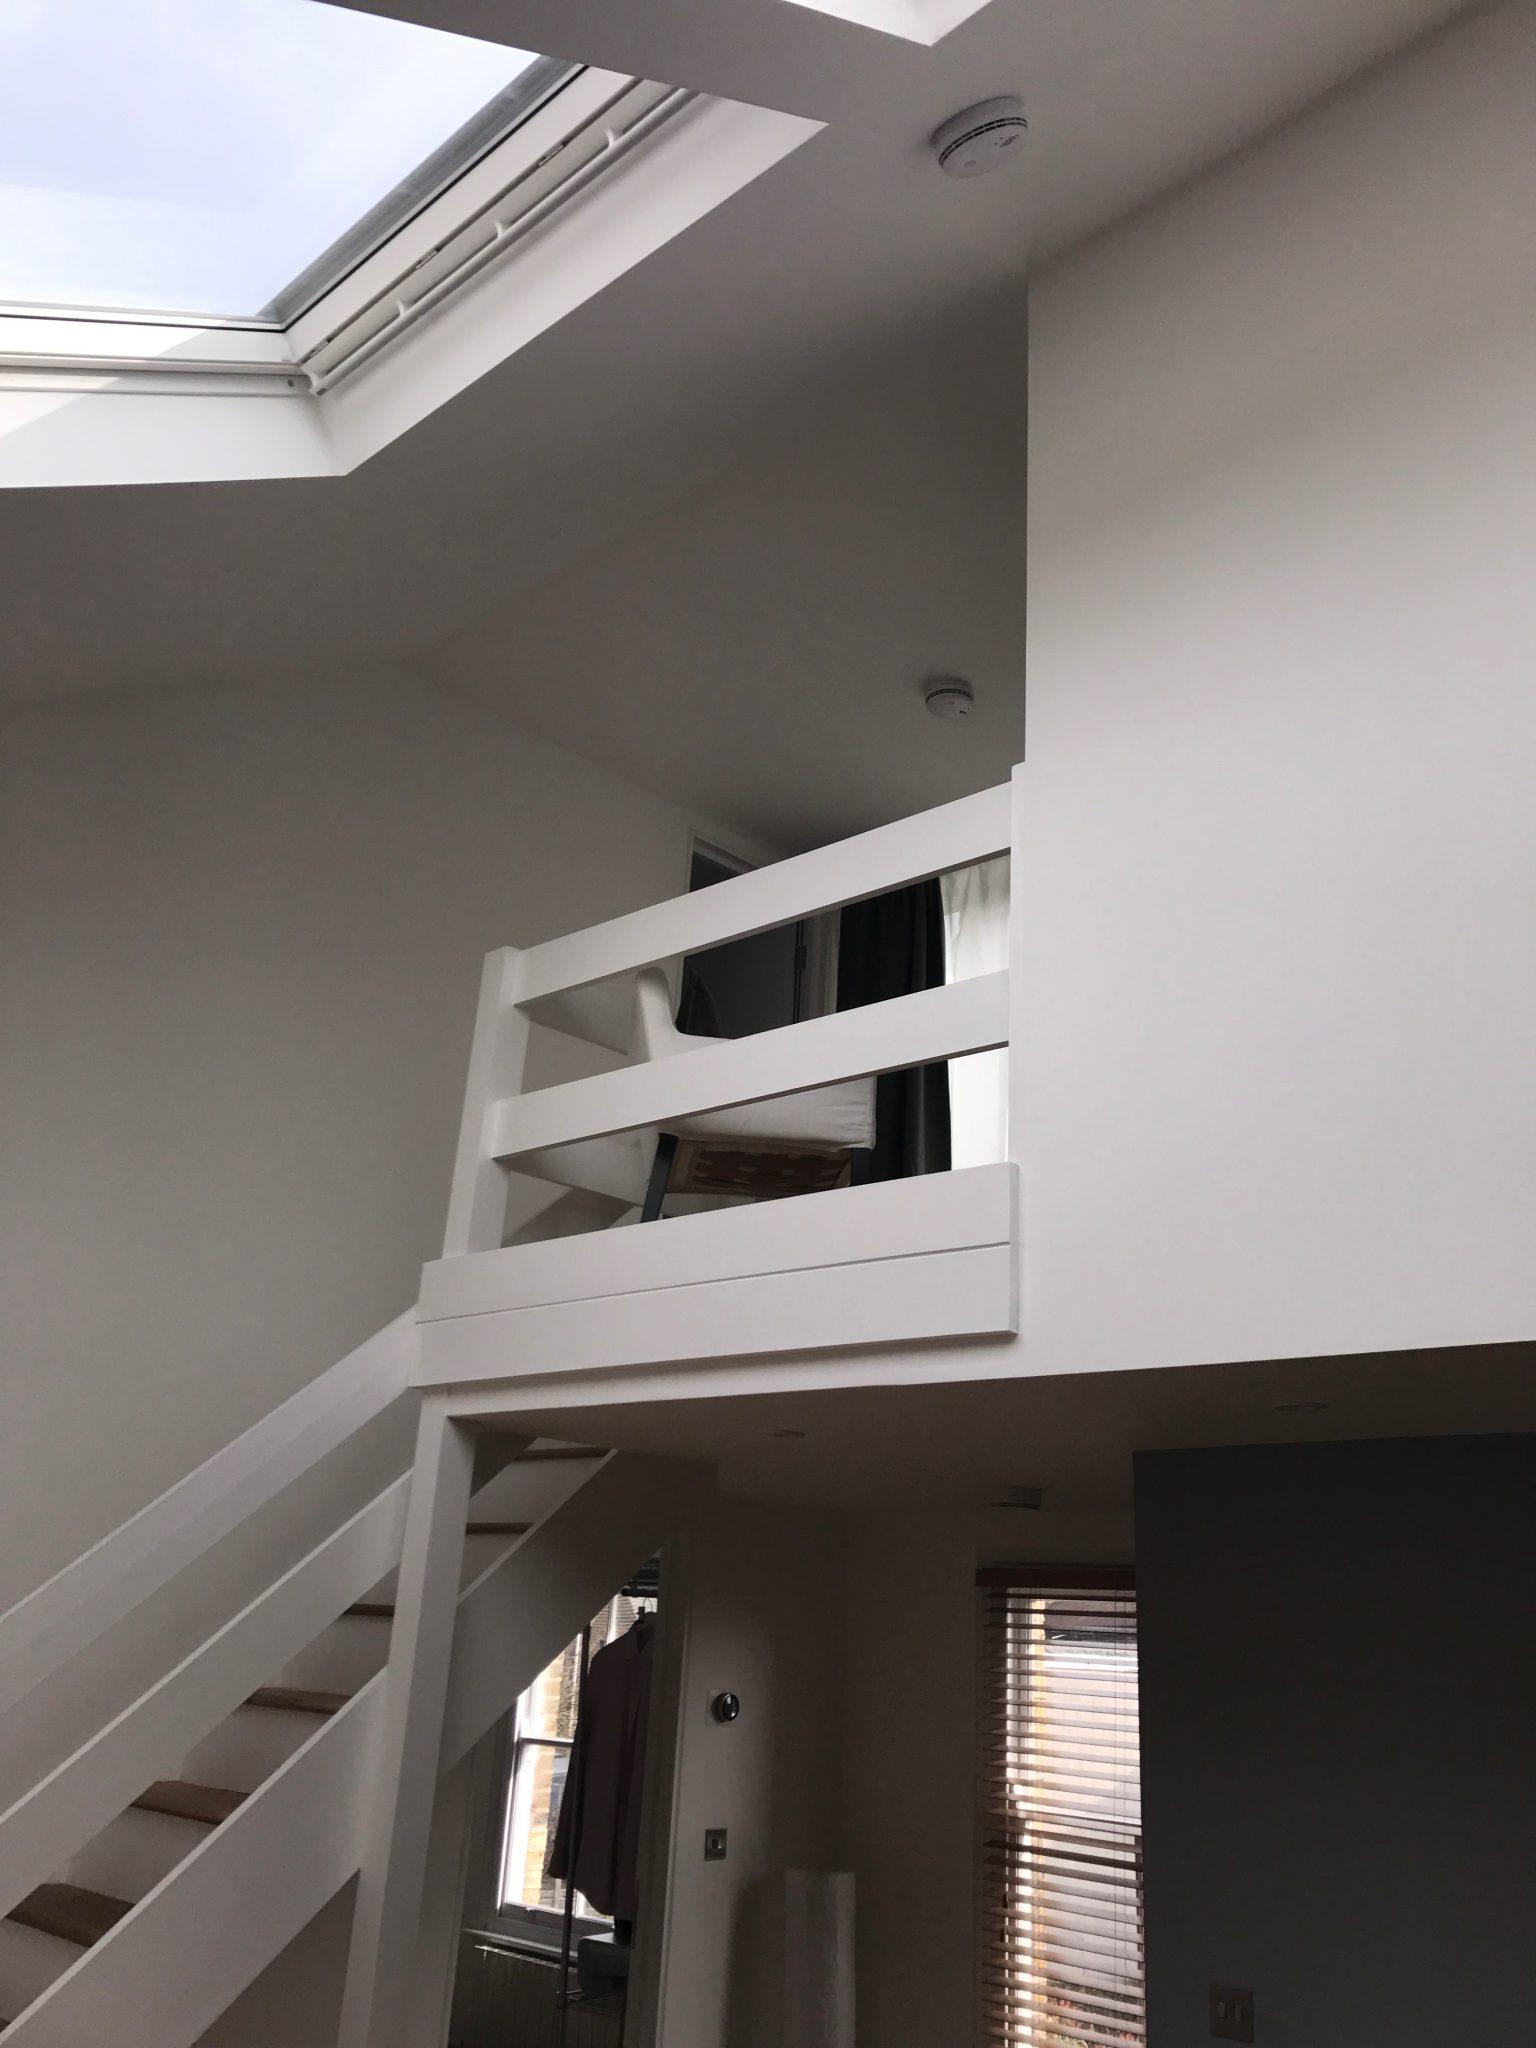 IMG 1621 - Loft Conversions